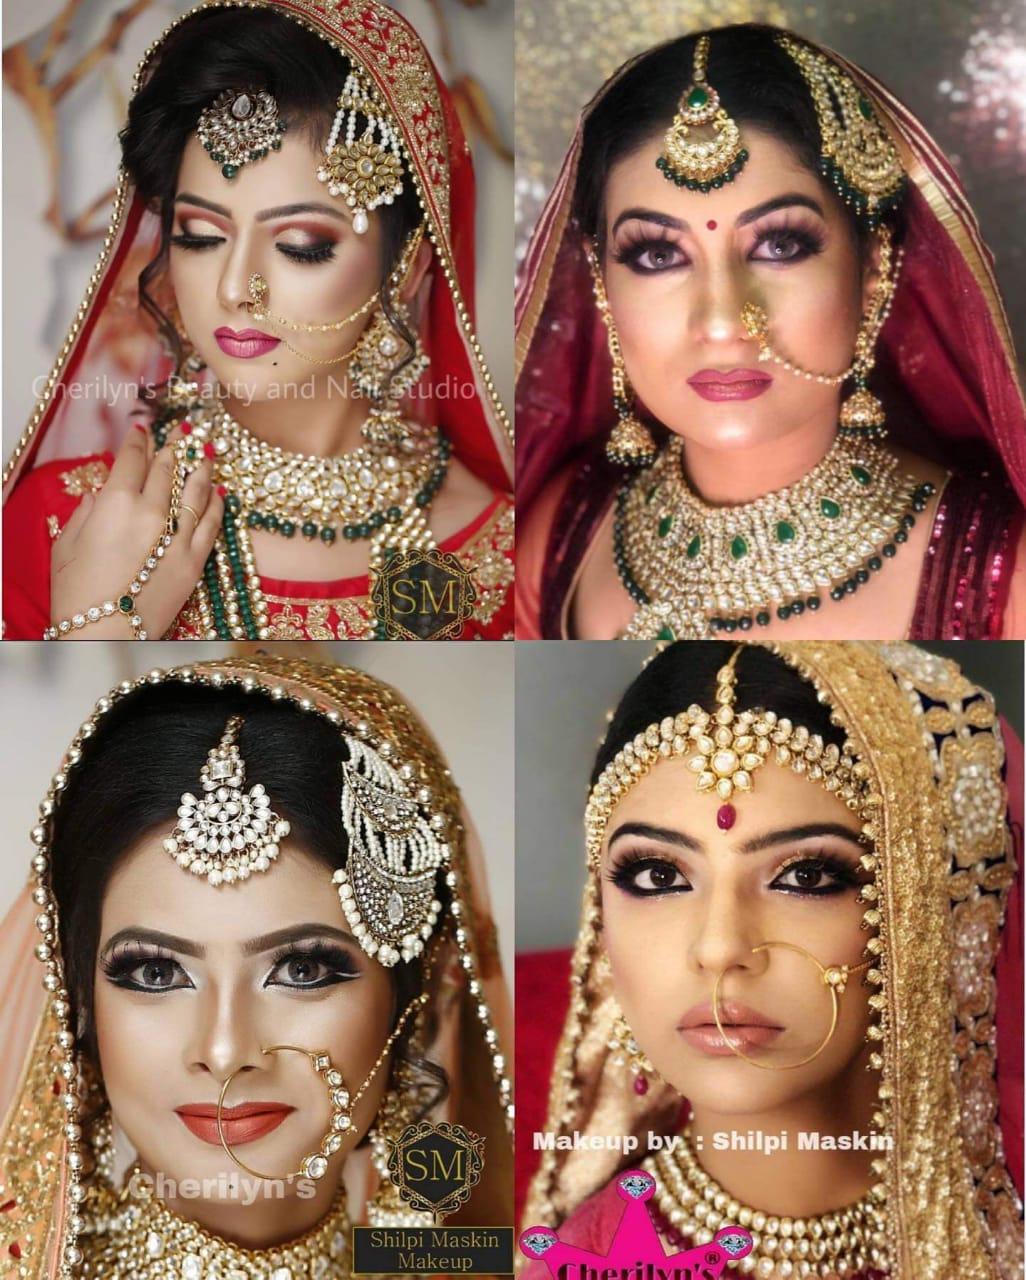 shilpi-maskin-makeup-artist-ludhiana